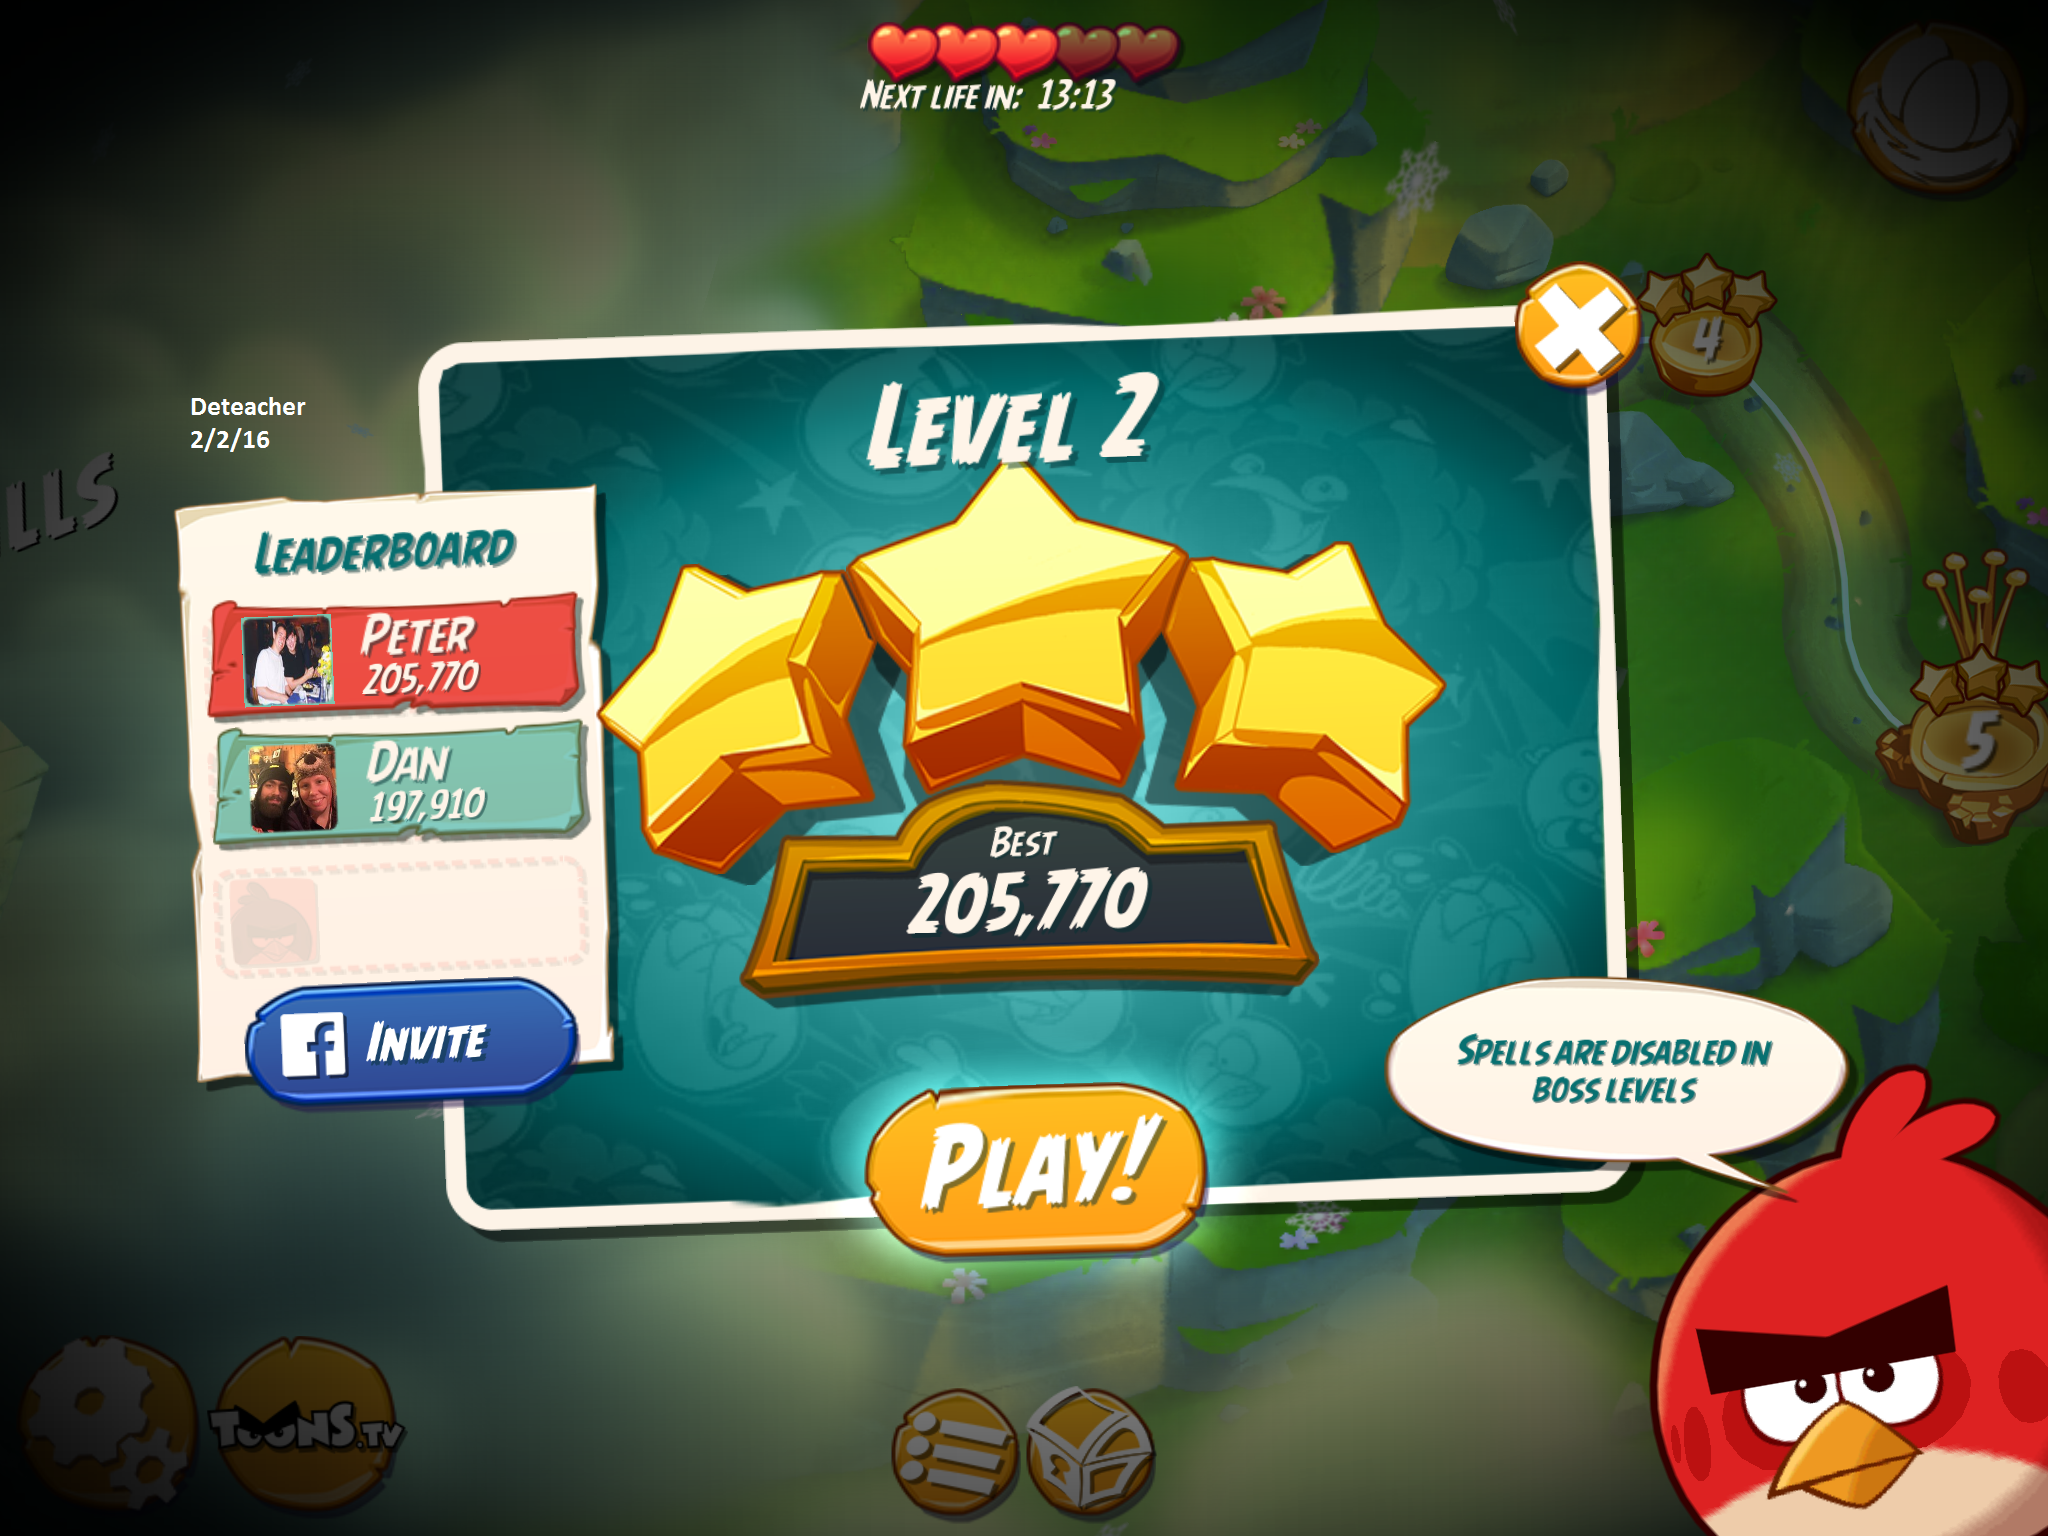 Deteacher: Angry Birds 2: Level 2 (iOS) 205,770 points on 2016-02-02 18:16:50